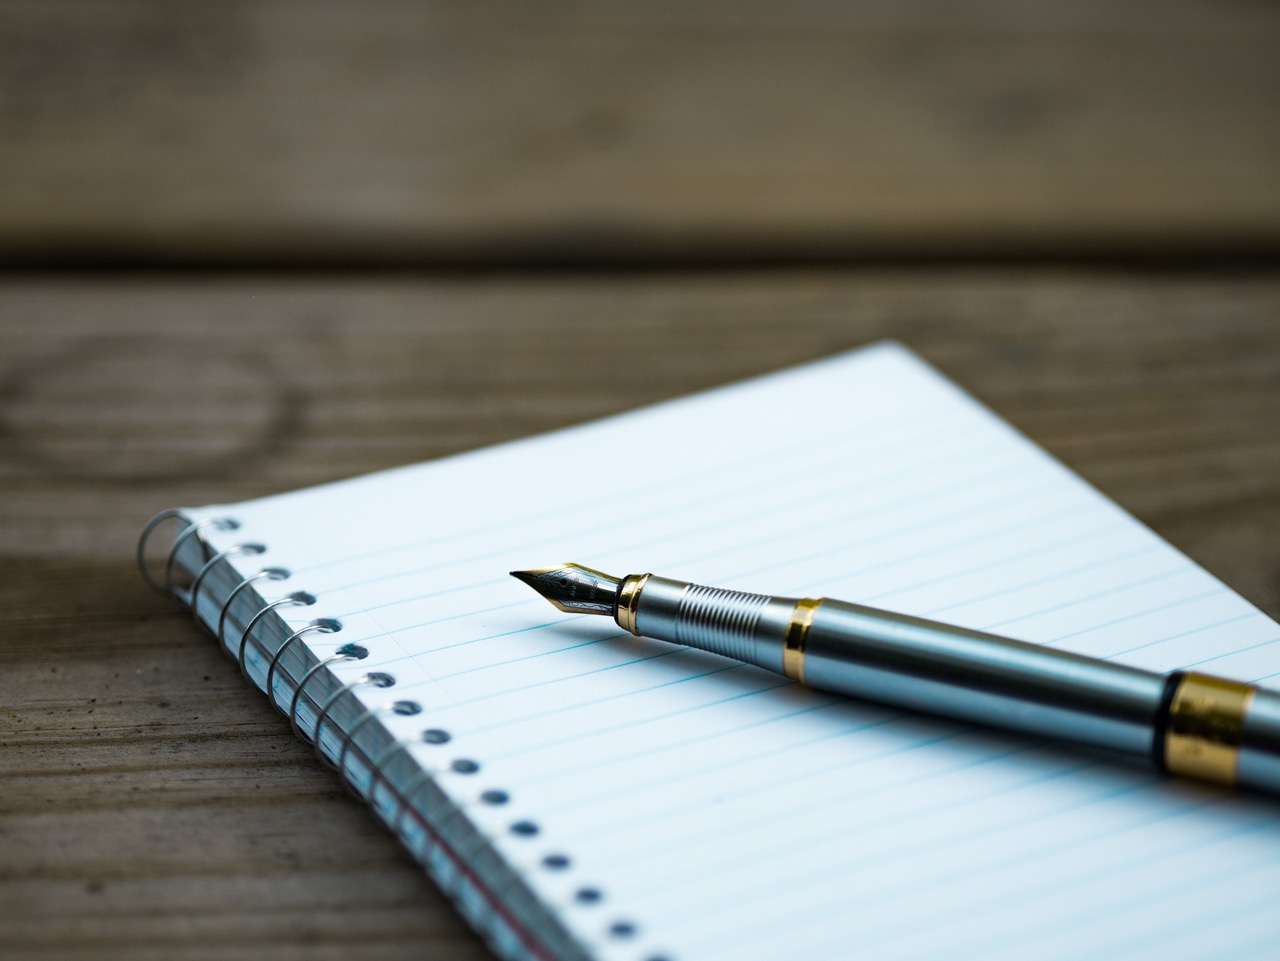 scrittura penna foglio